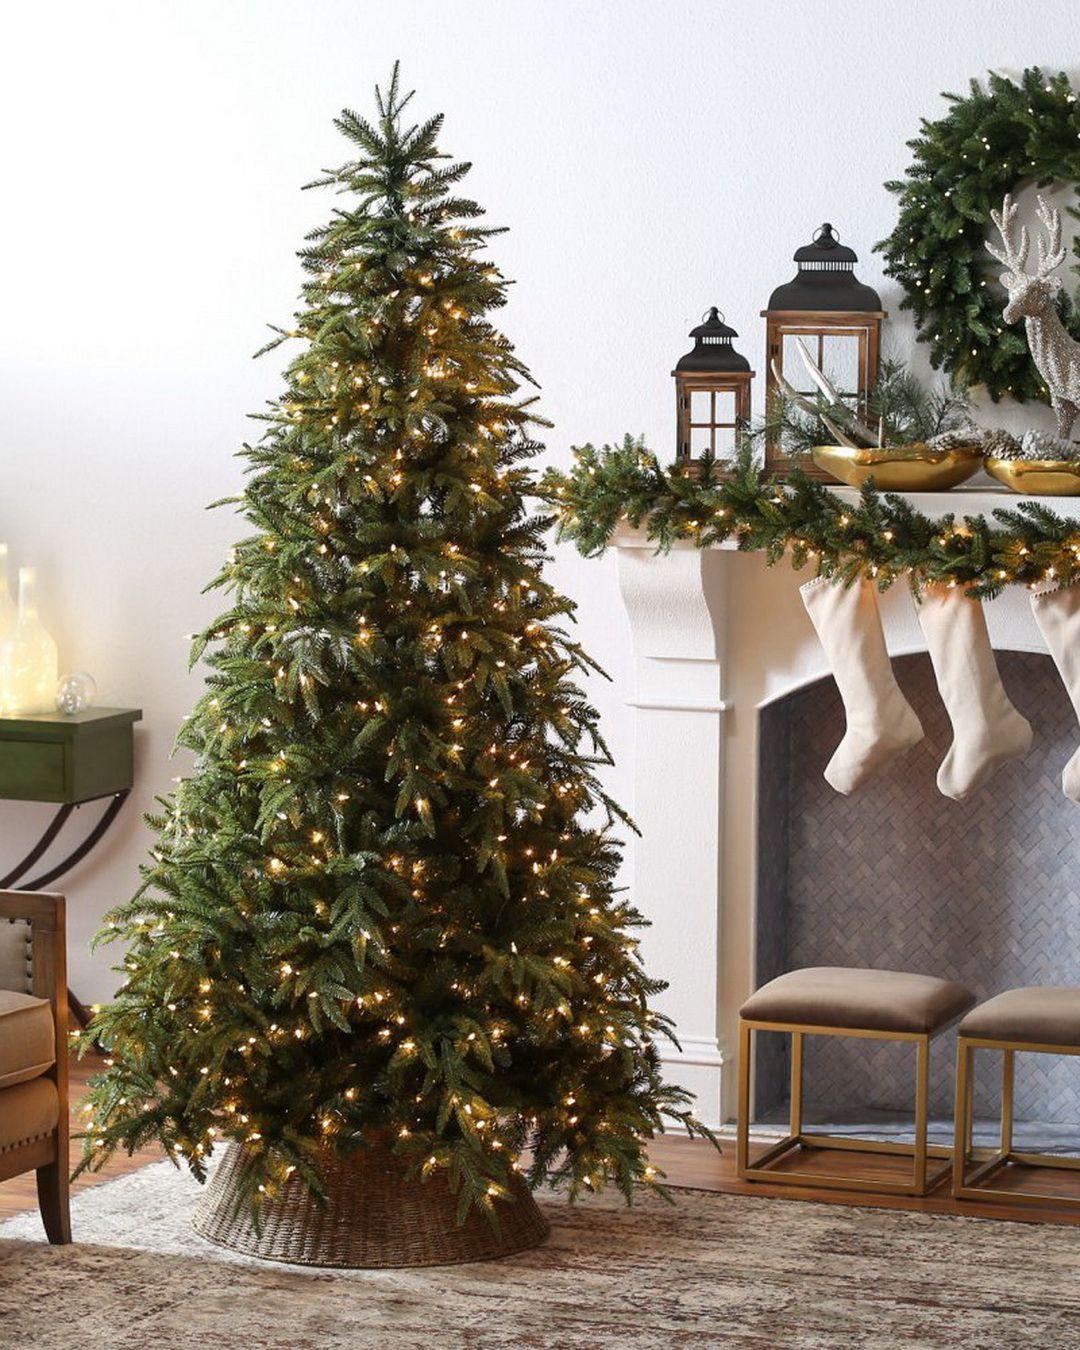 Belham Living 7 5 Ft Classic Mixed Needle Pre Lit Full Christmas Tree Fake Christmas Trees Pre Lit Christmas Tree Full Christmas Tree